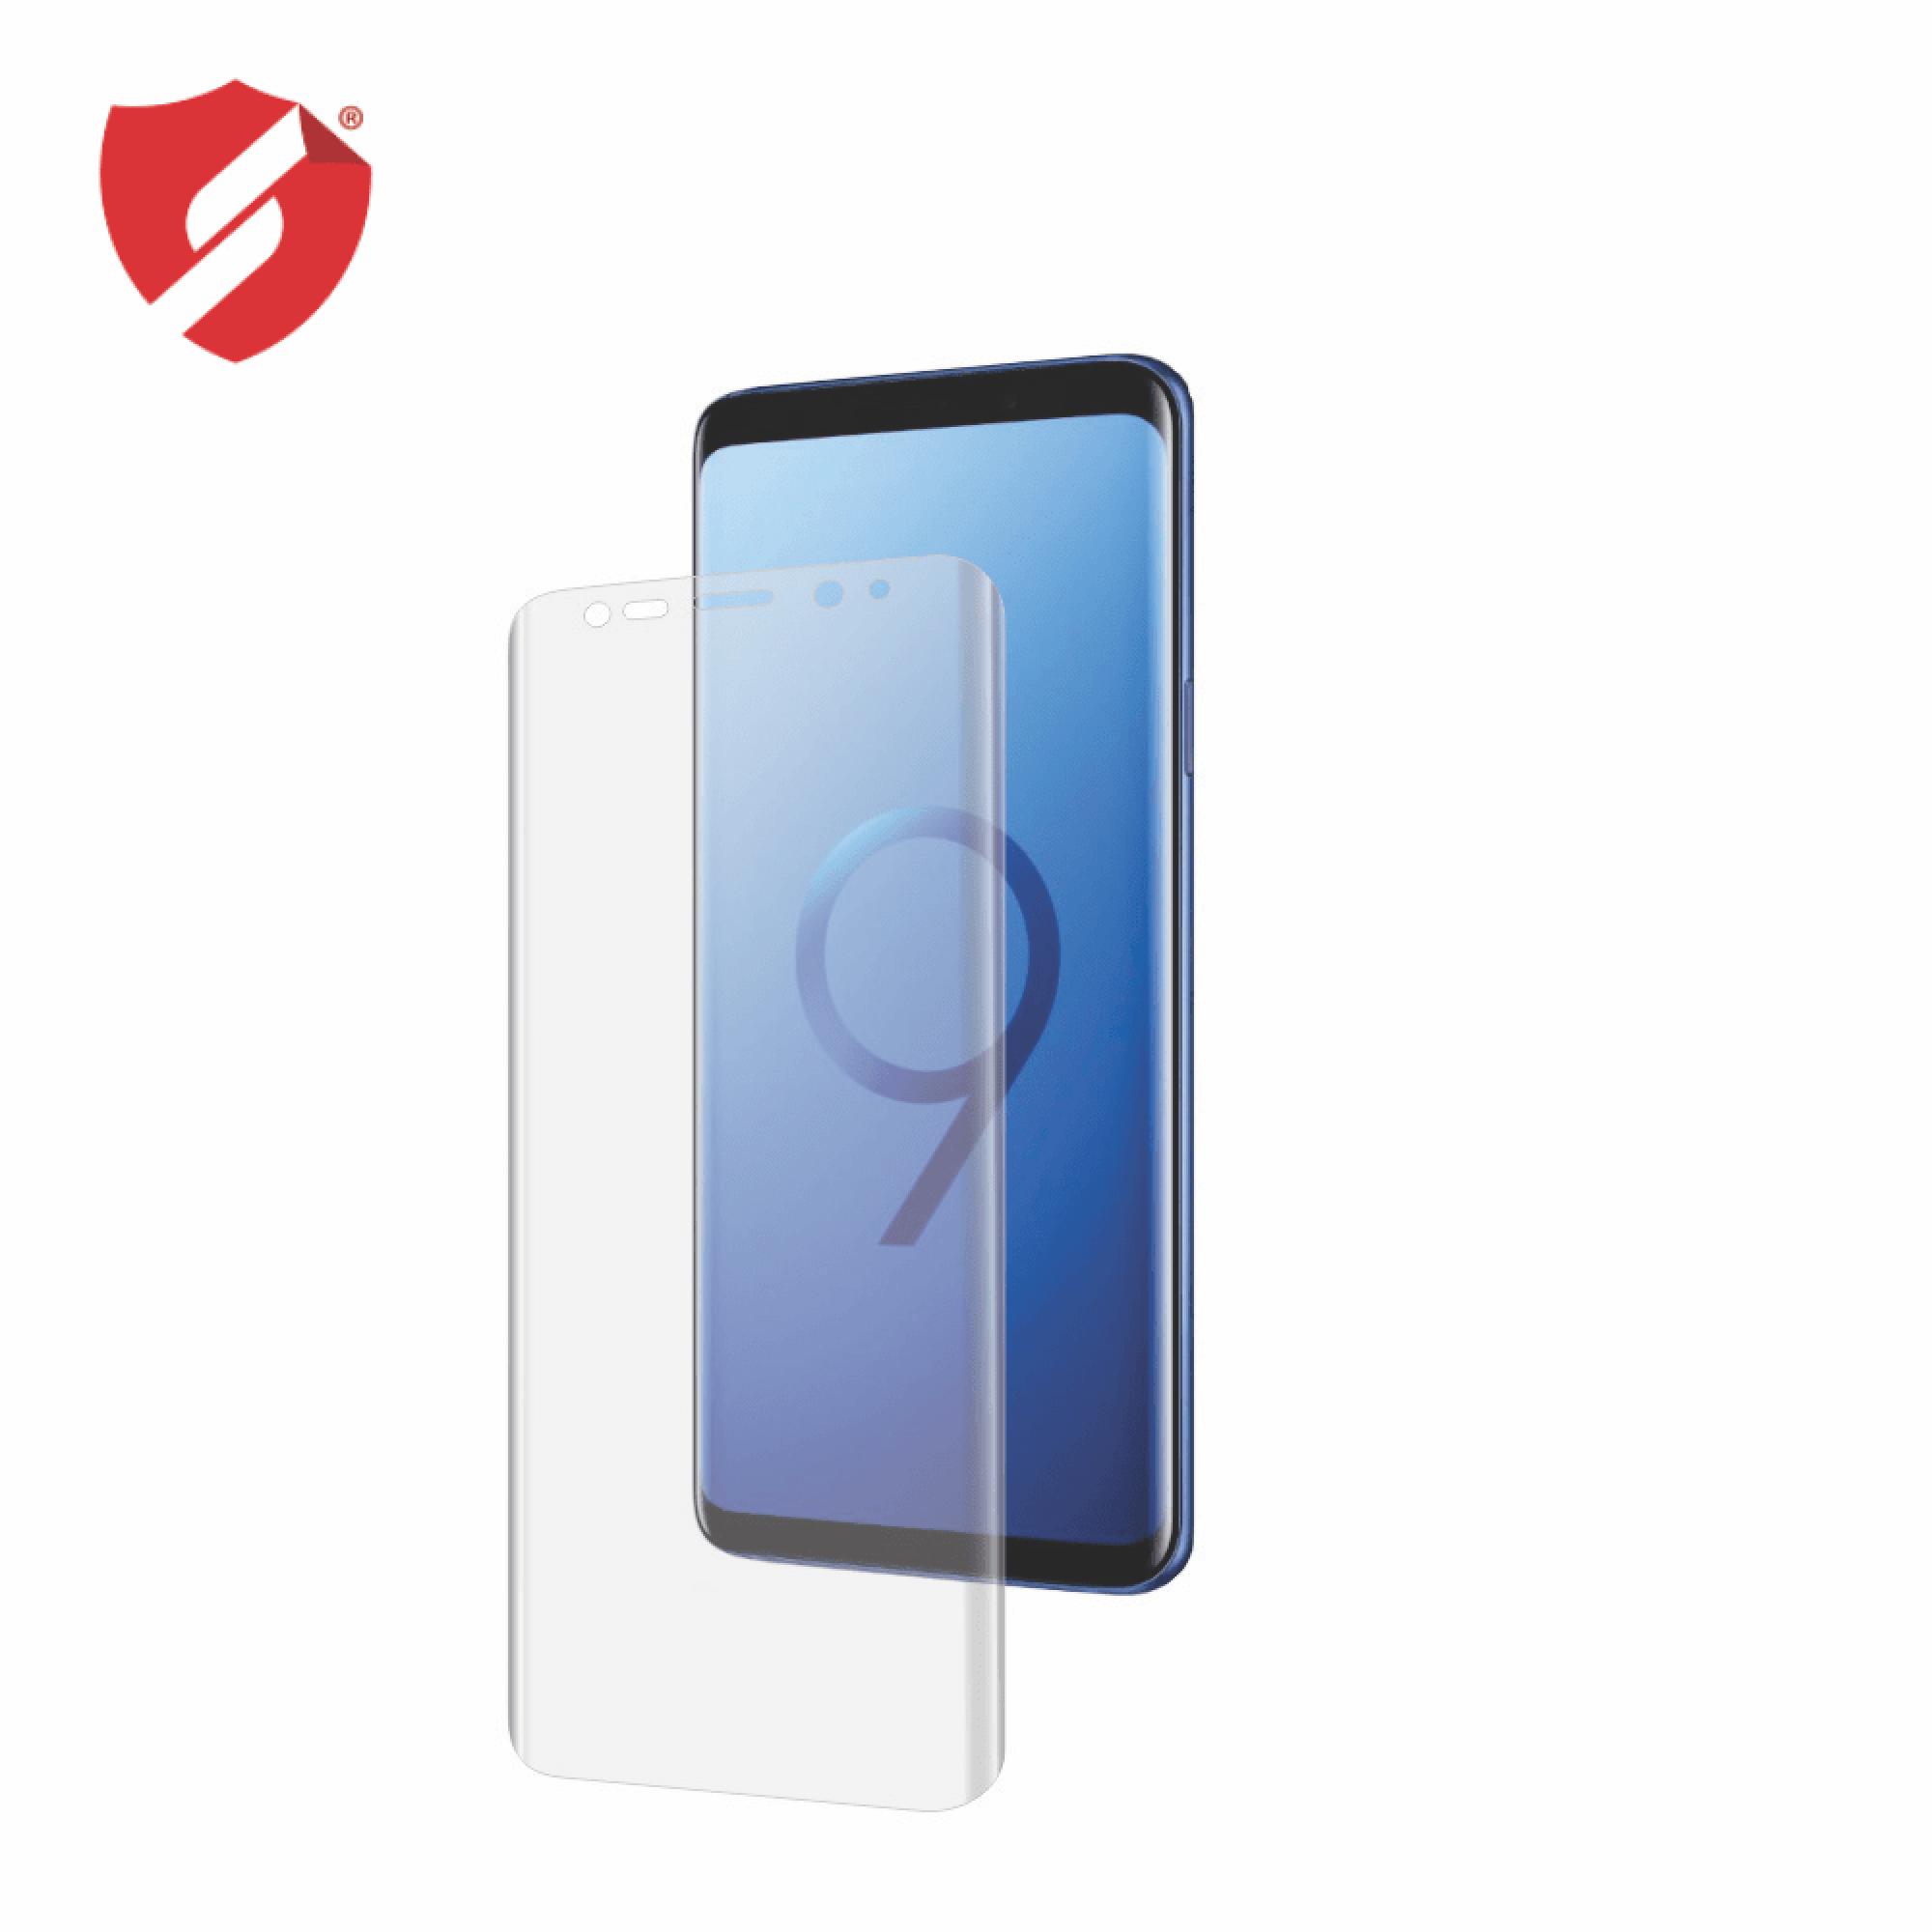 Folie de protectie Smart Protection Samsung Galaxy S9 Plus compatibila cu carcasa Spigen Thin Fit - doar-display imagine